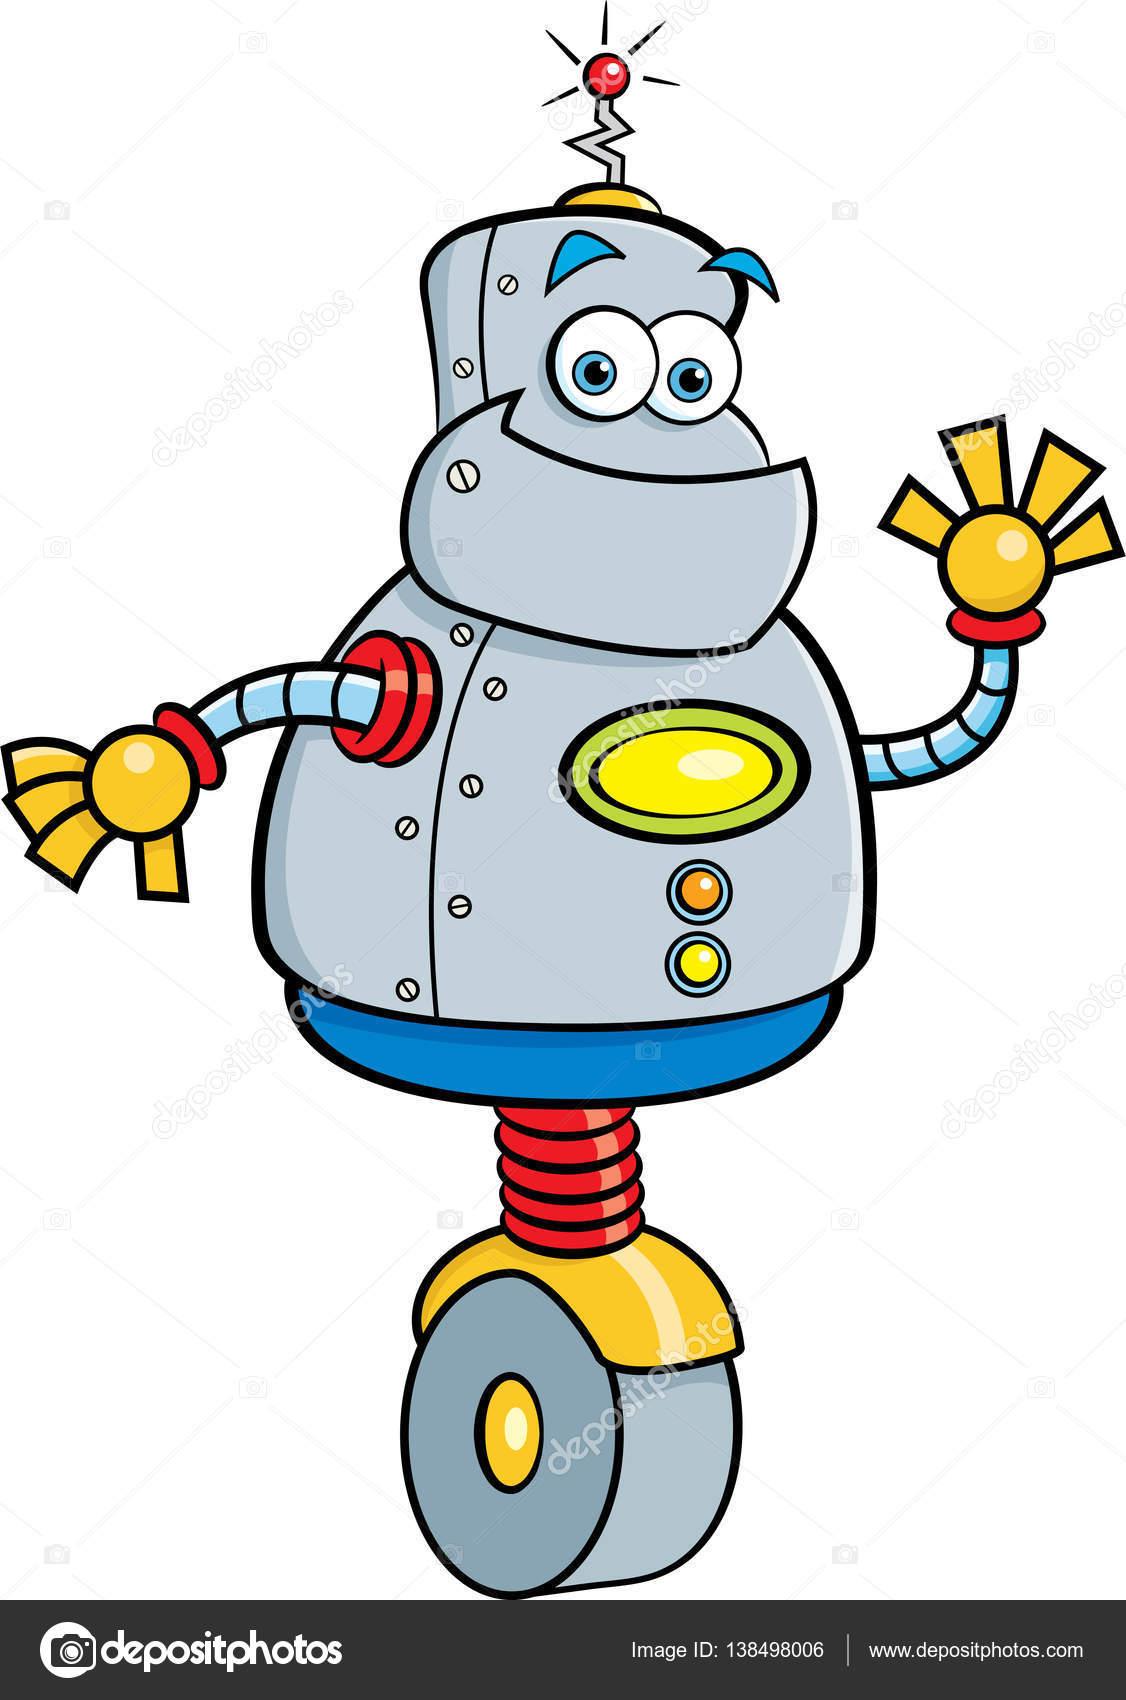 depositphotos_138498006-stock-illustration-cartoon-robot-waving.jpg